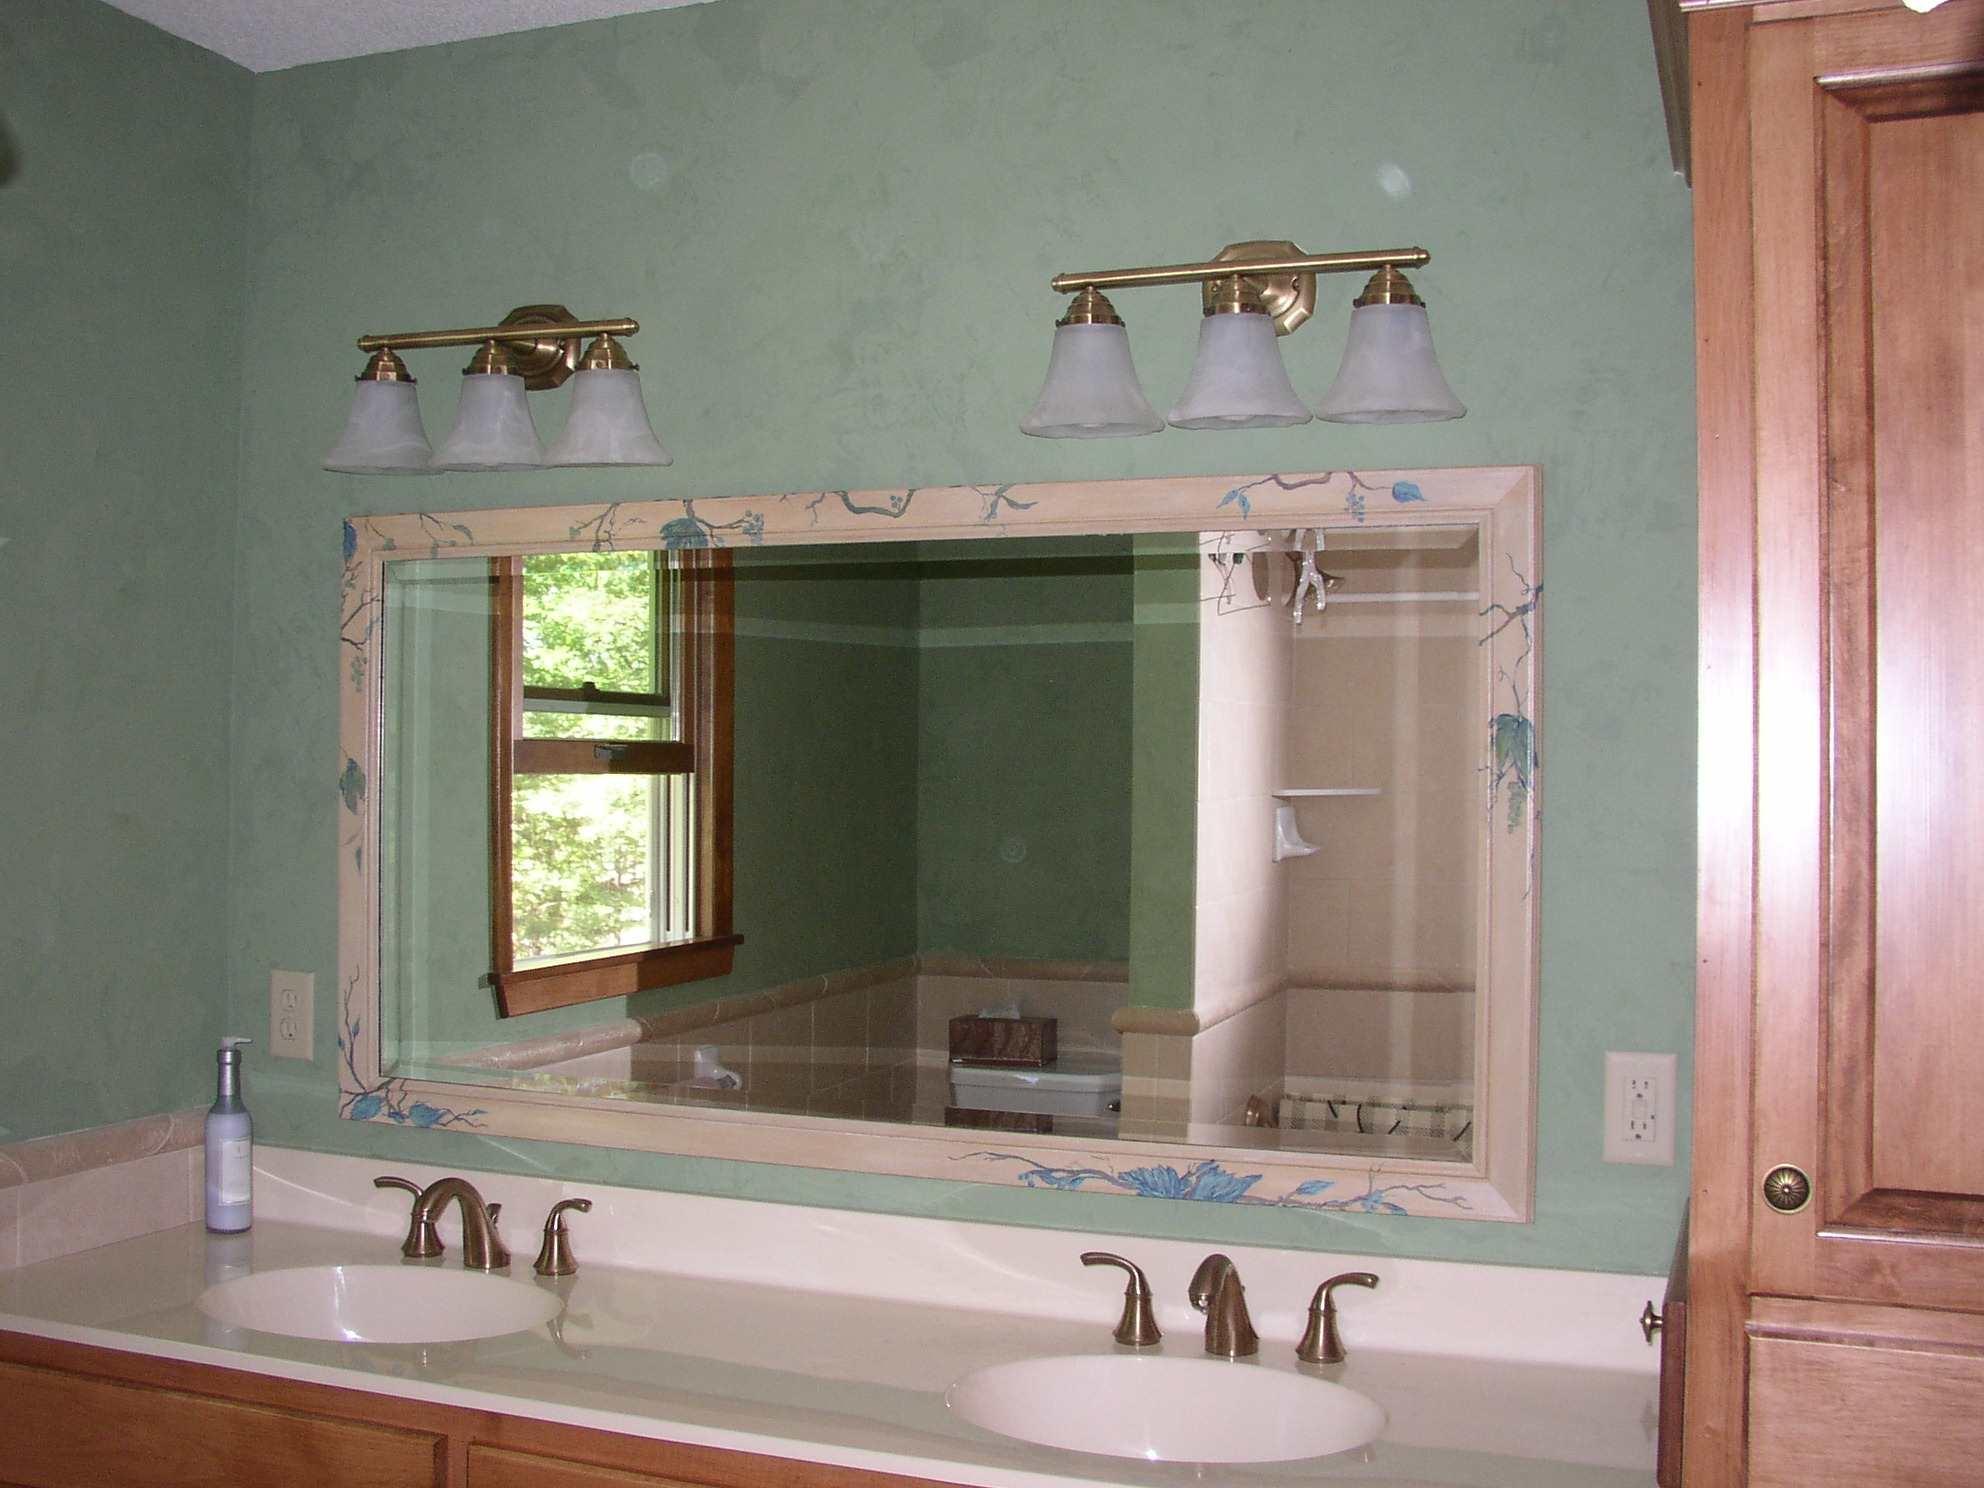 Venetian Plaster Bathroom With Mirror Embellishment Mn Artists Pertaining To Venetian Bathroom Mirror (View 13 of 15)